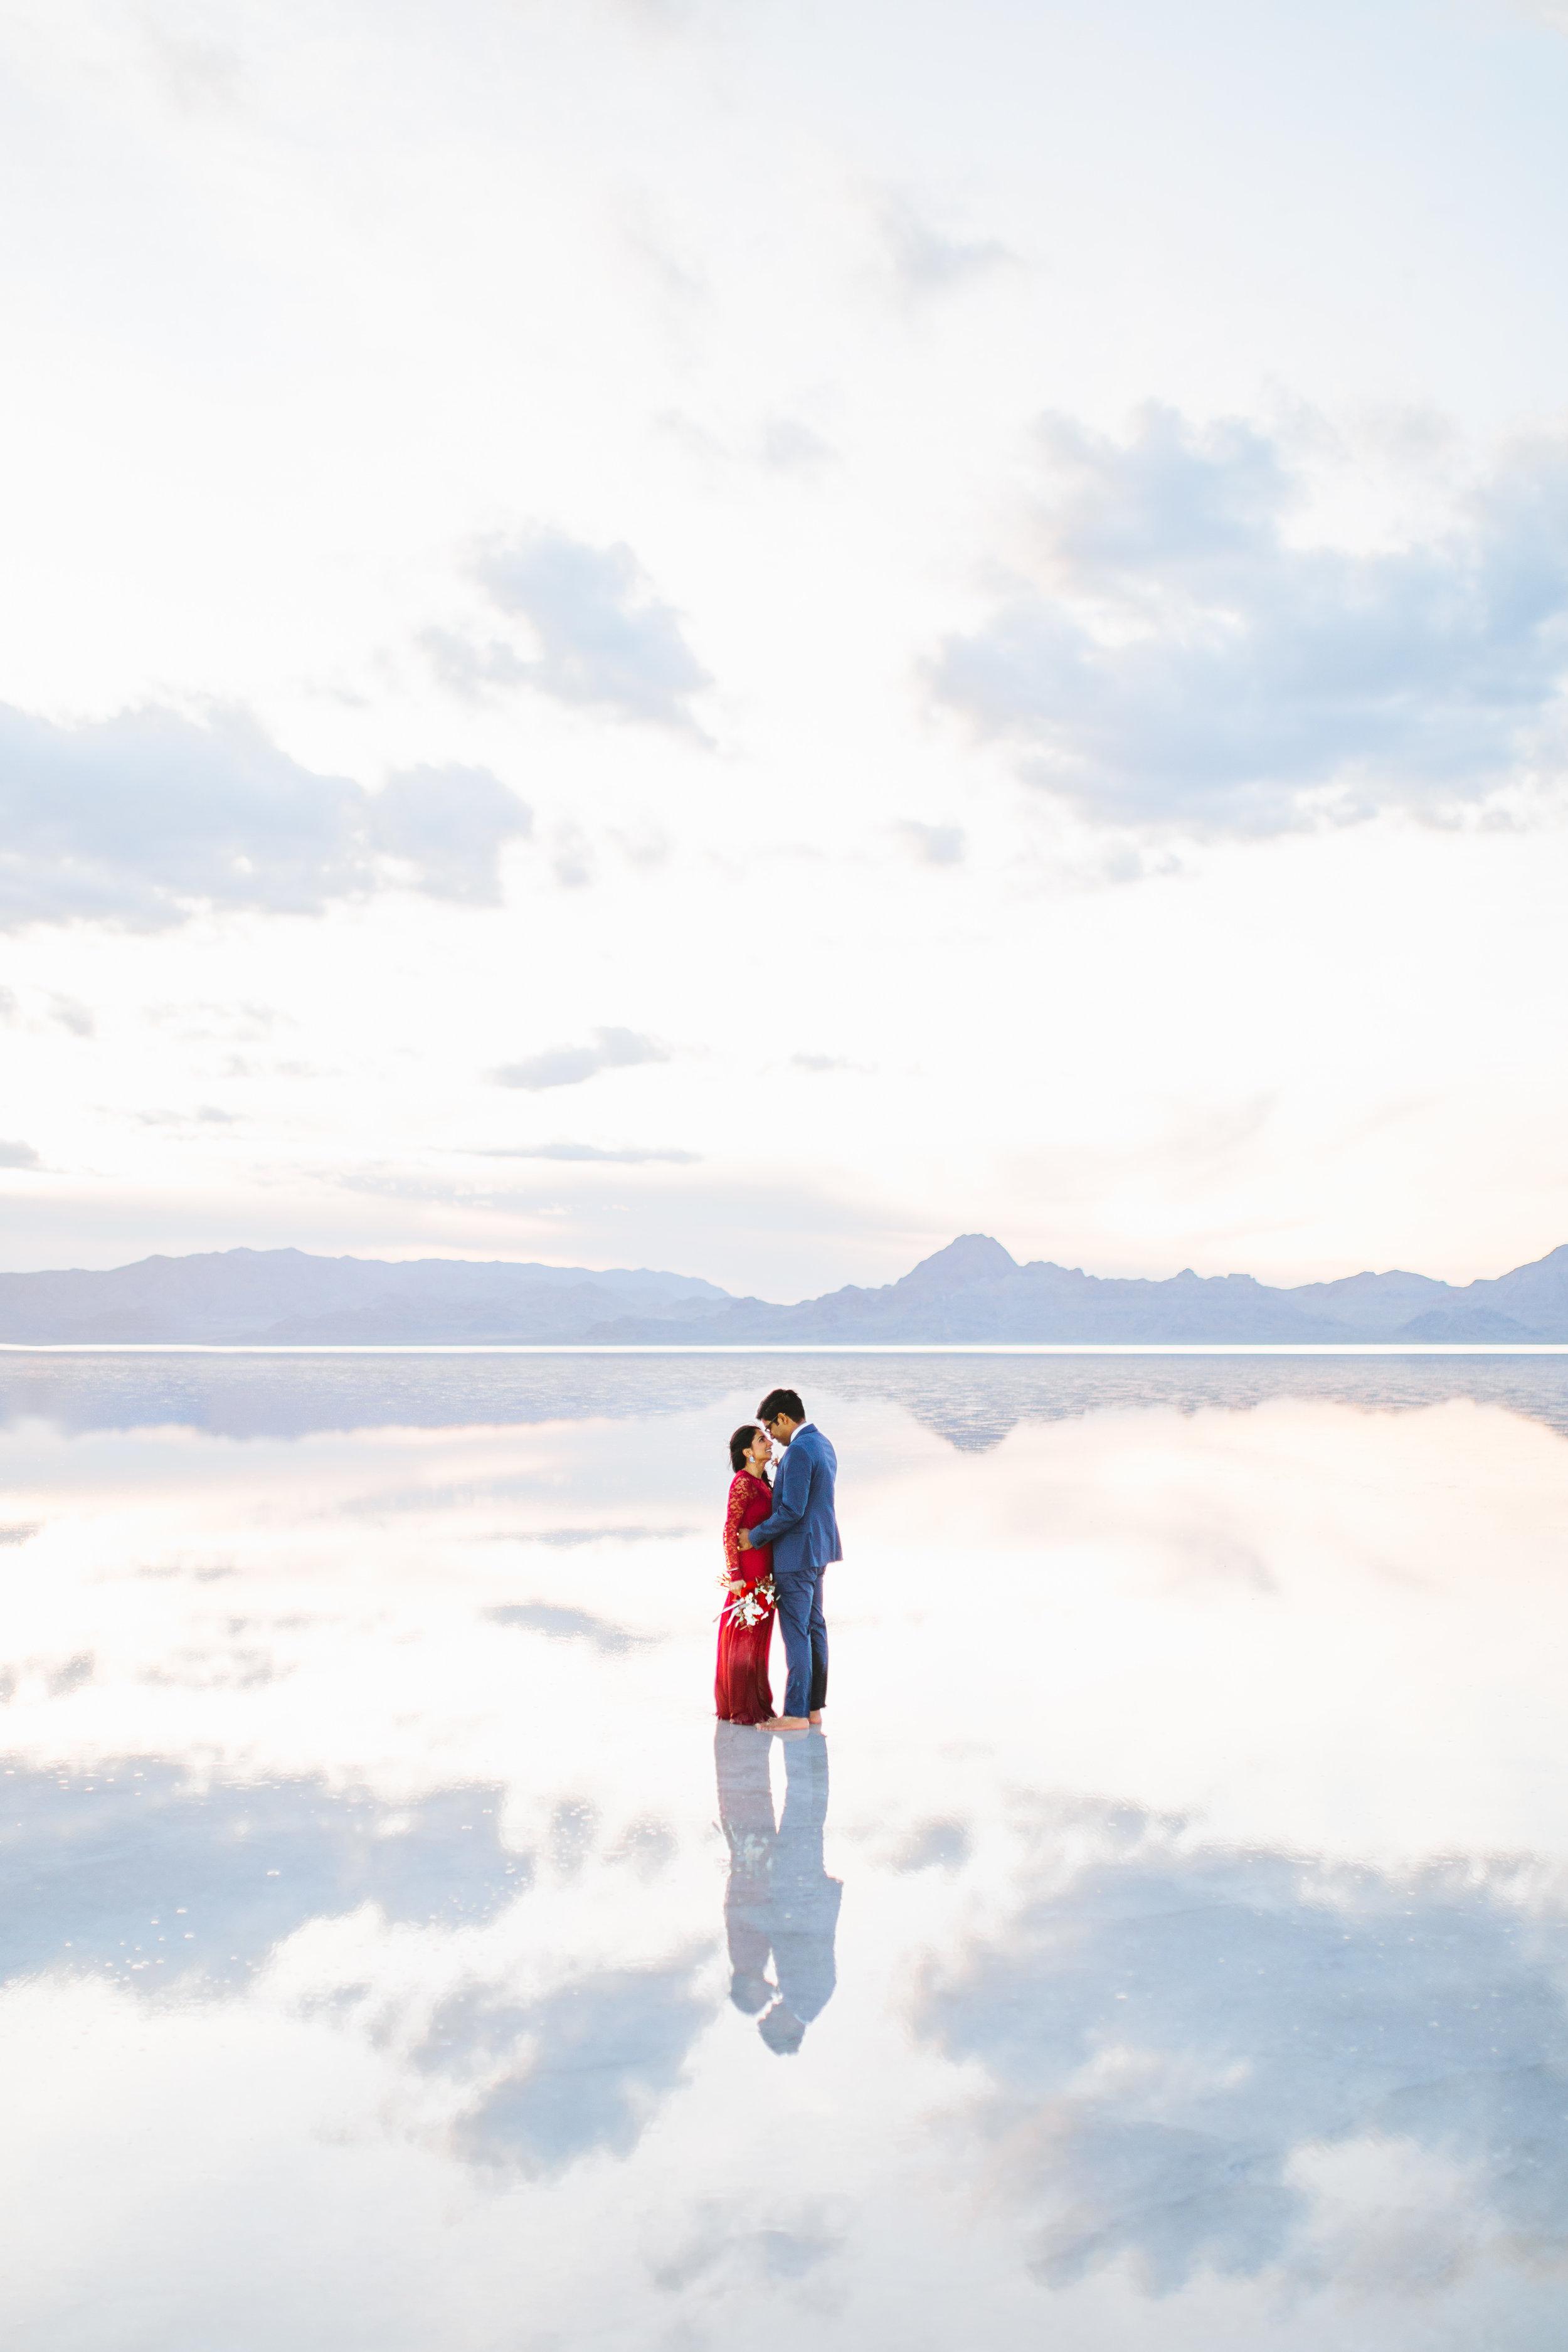 bonneville-salt-flats-engagement-couple-photos-destination-wedding-photography-14.jpg